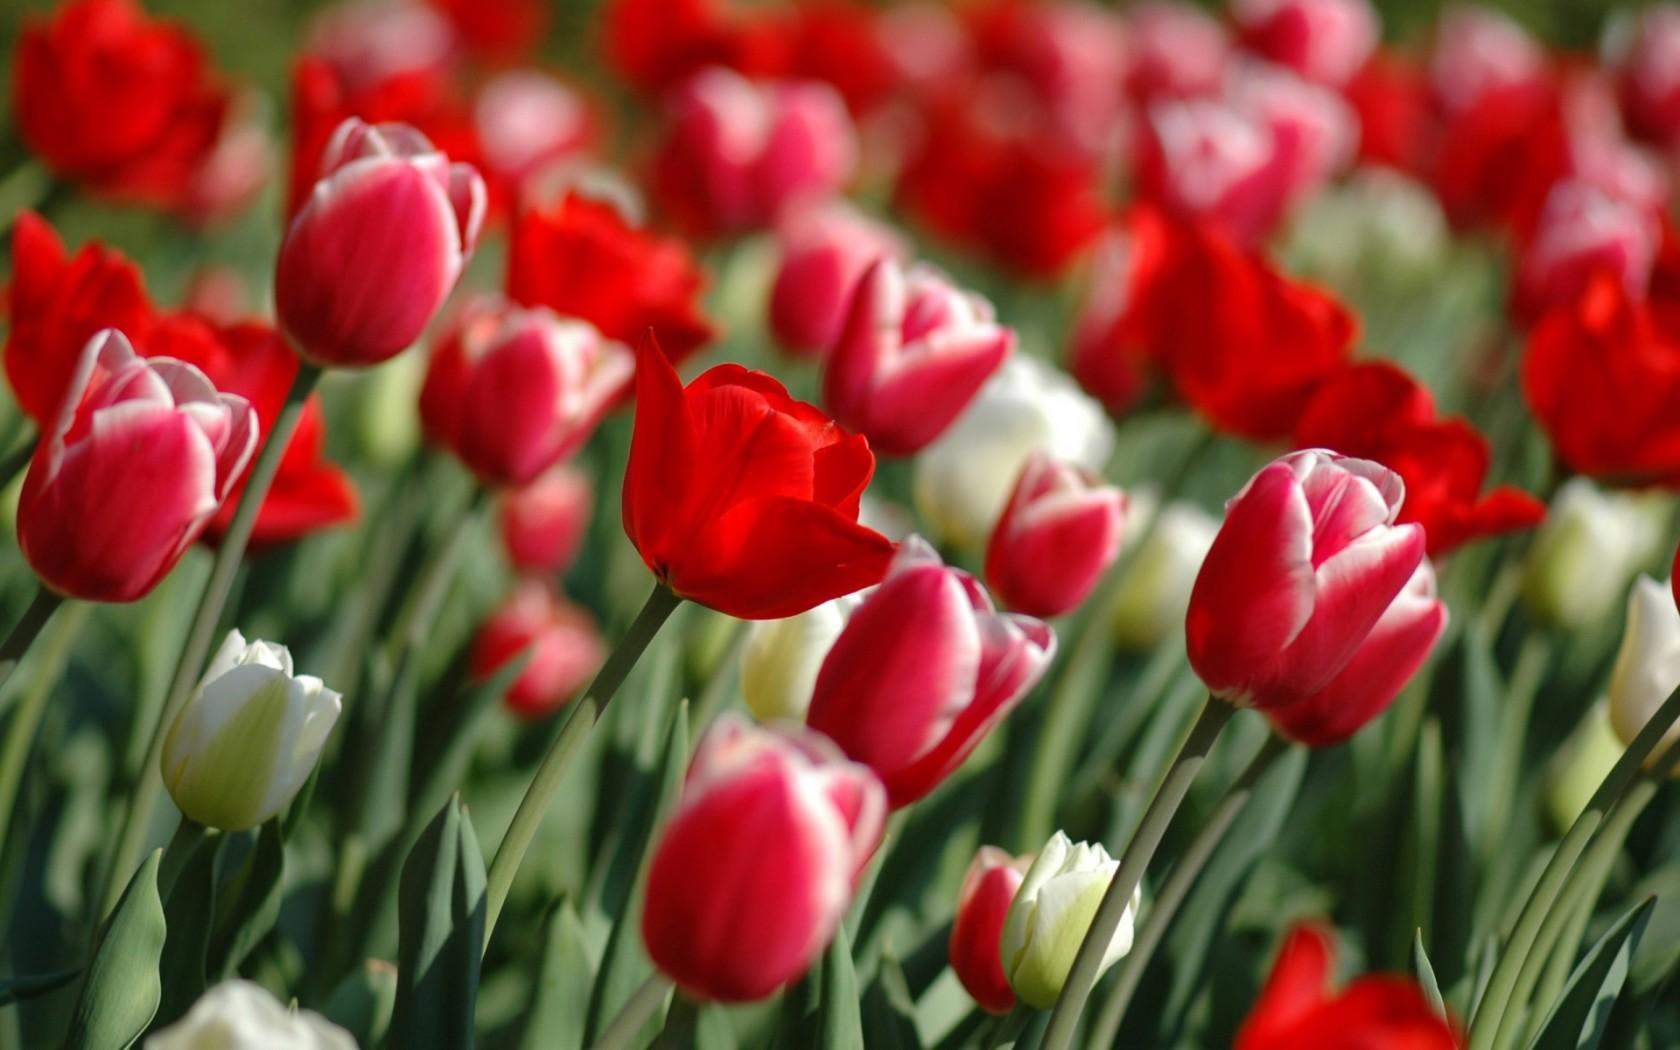 ВЕСНА пришла!!! Nature_Flowers_Tulips_spring__Flowers_008359_